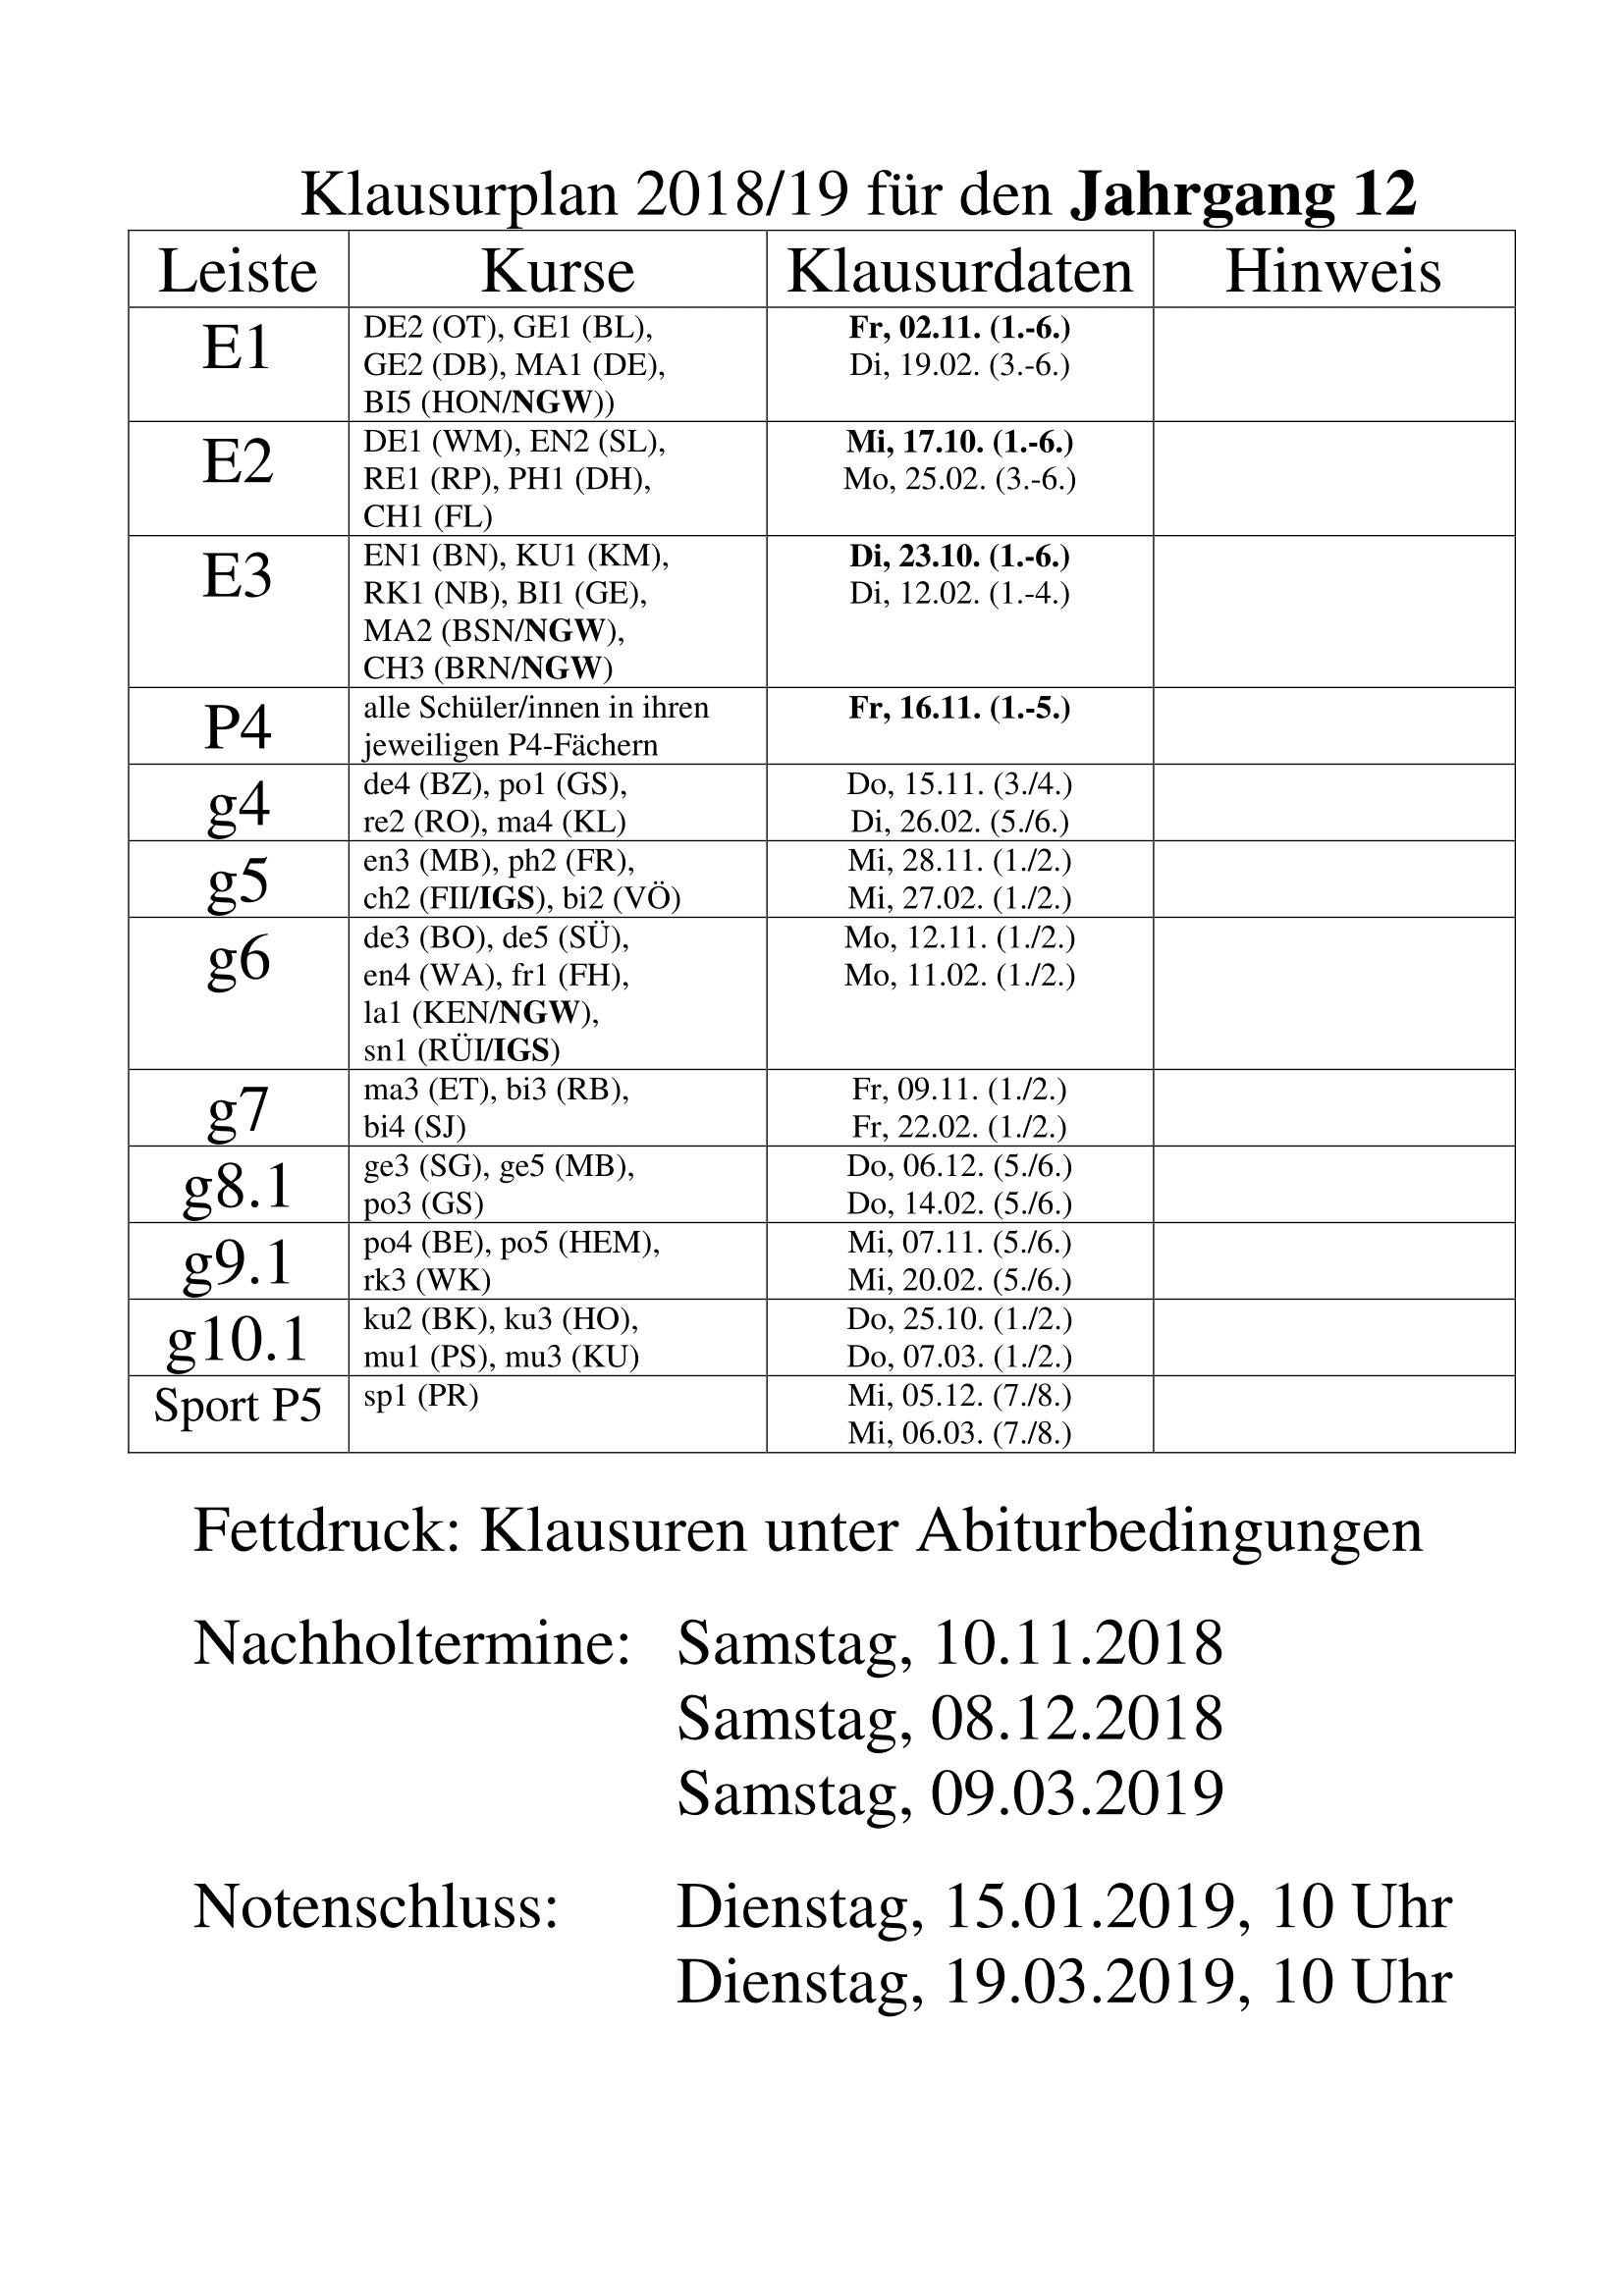 Klausurplan Jahrgang 12 Cäcilienschule Wilhelmshaven